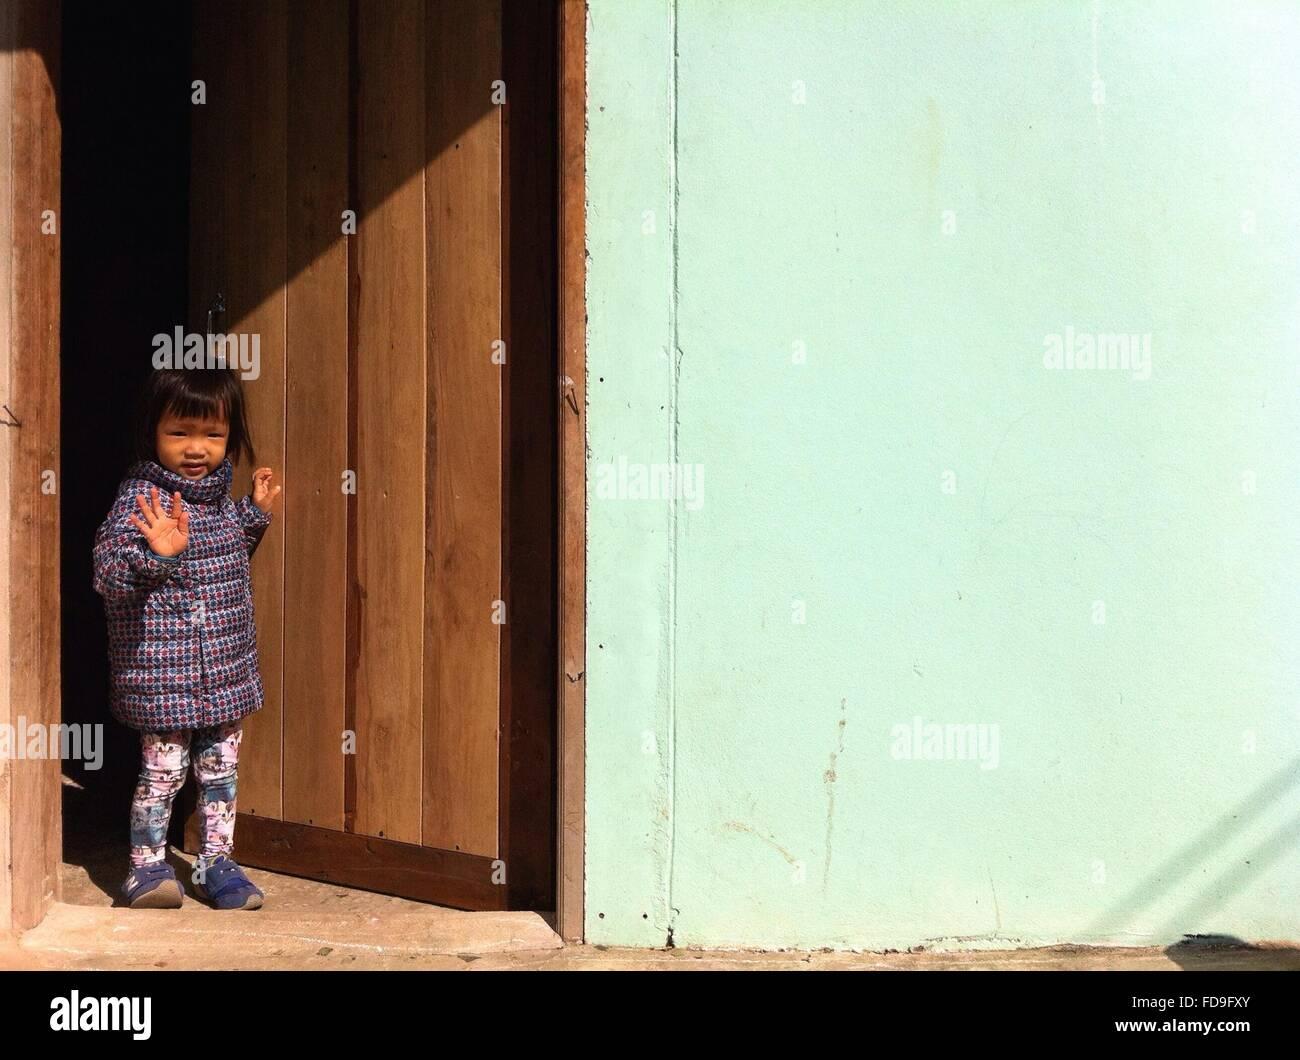 Girl Standing At Door And Waving Hand - Stock Image